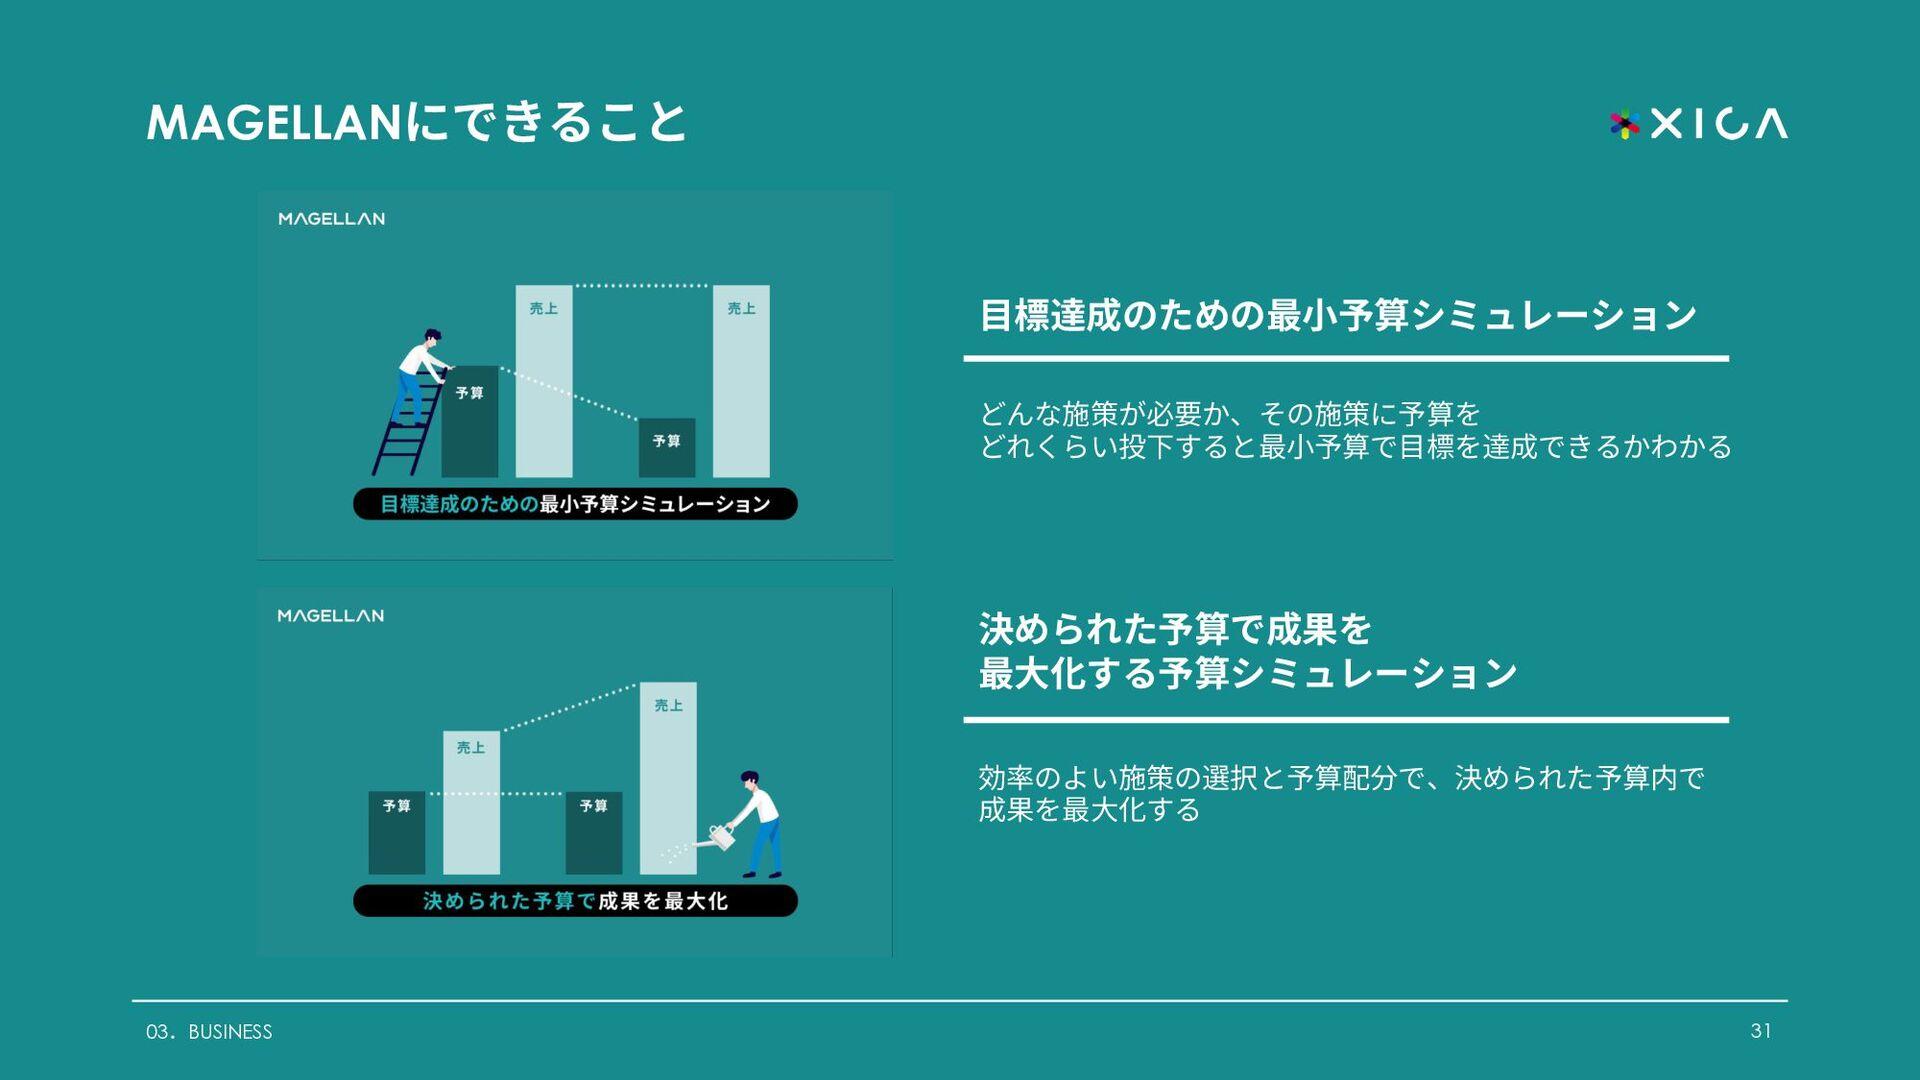 ADVA CREATOR アドバ クリエイターとは︖ 31 03.BUSINESS ADVA ...